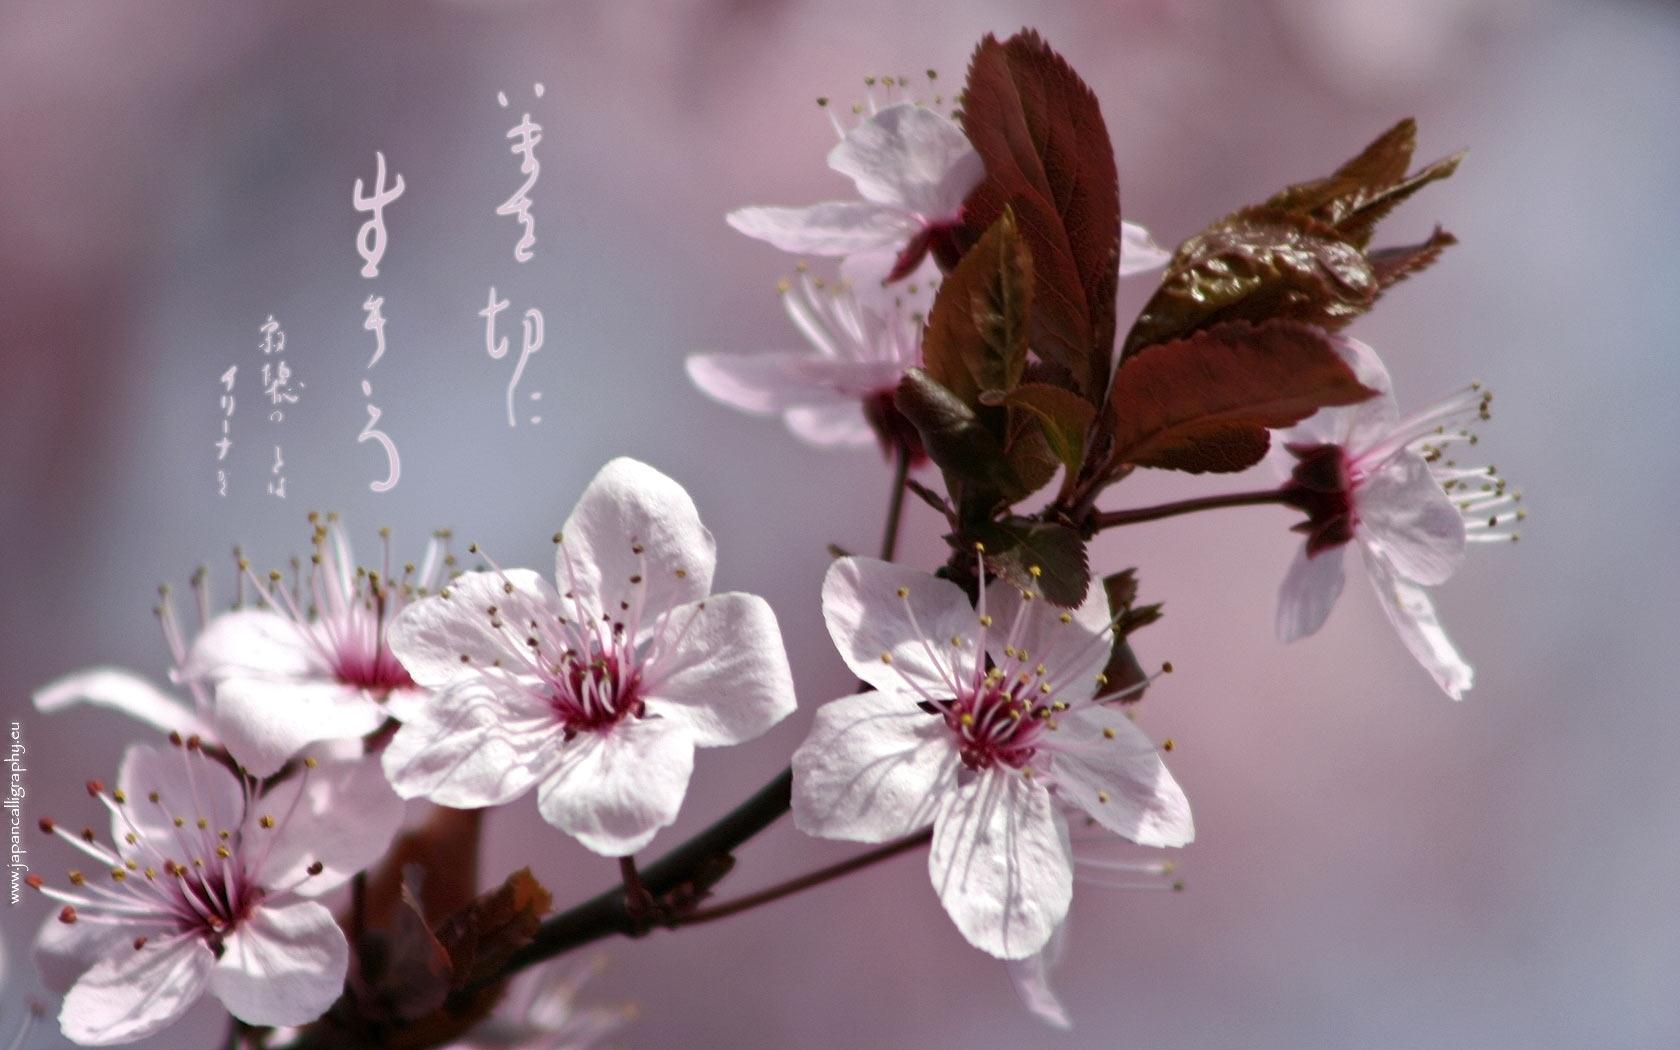 Japanese Calligraphy Wallpaper Spring Japanese Calligraphy